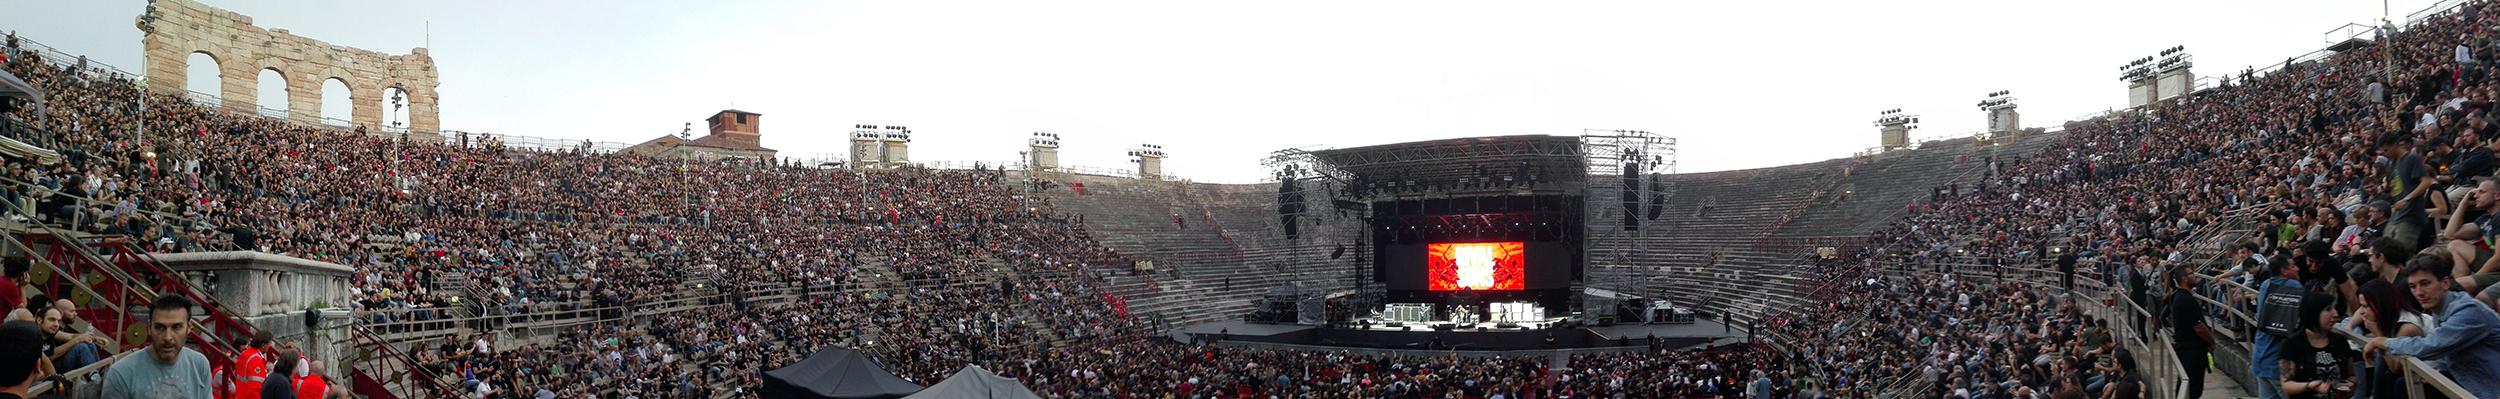 06.Verona giugno 2016 concerto Black Sabbath Arena.panoramab